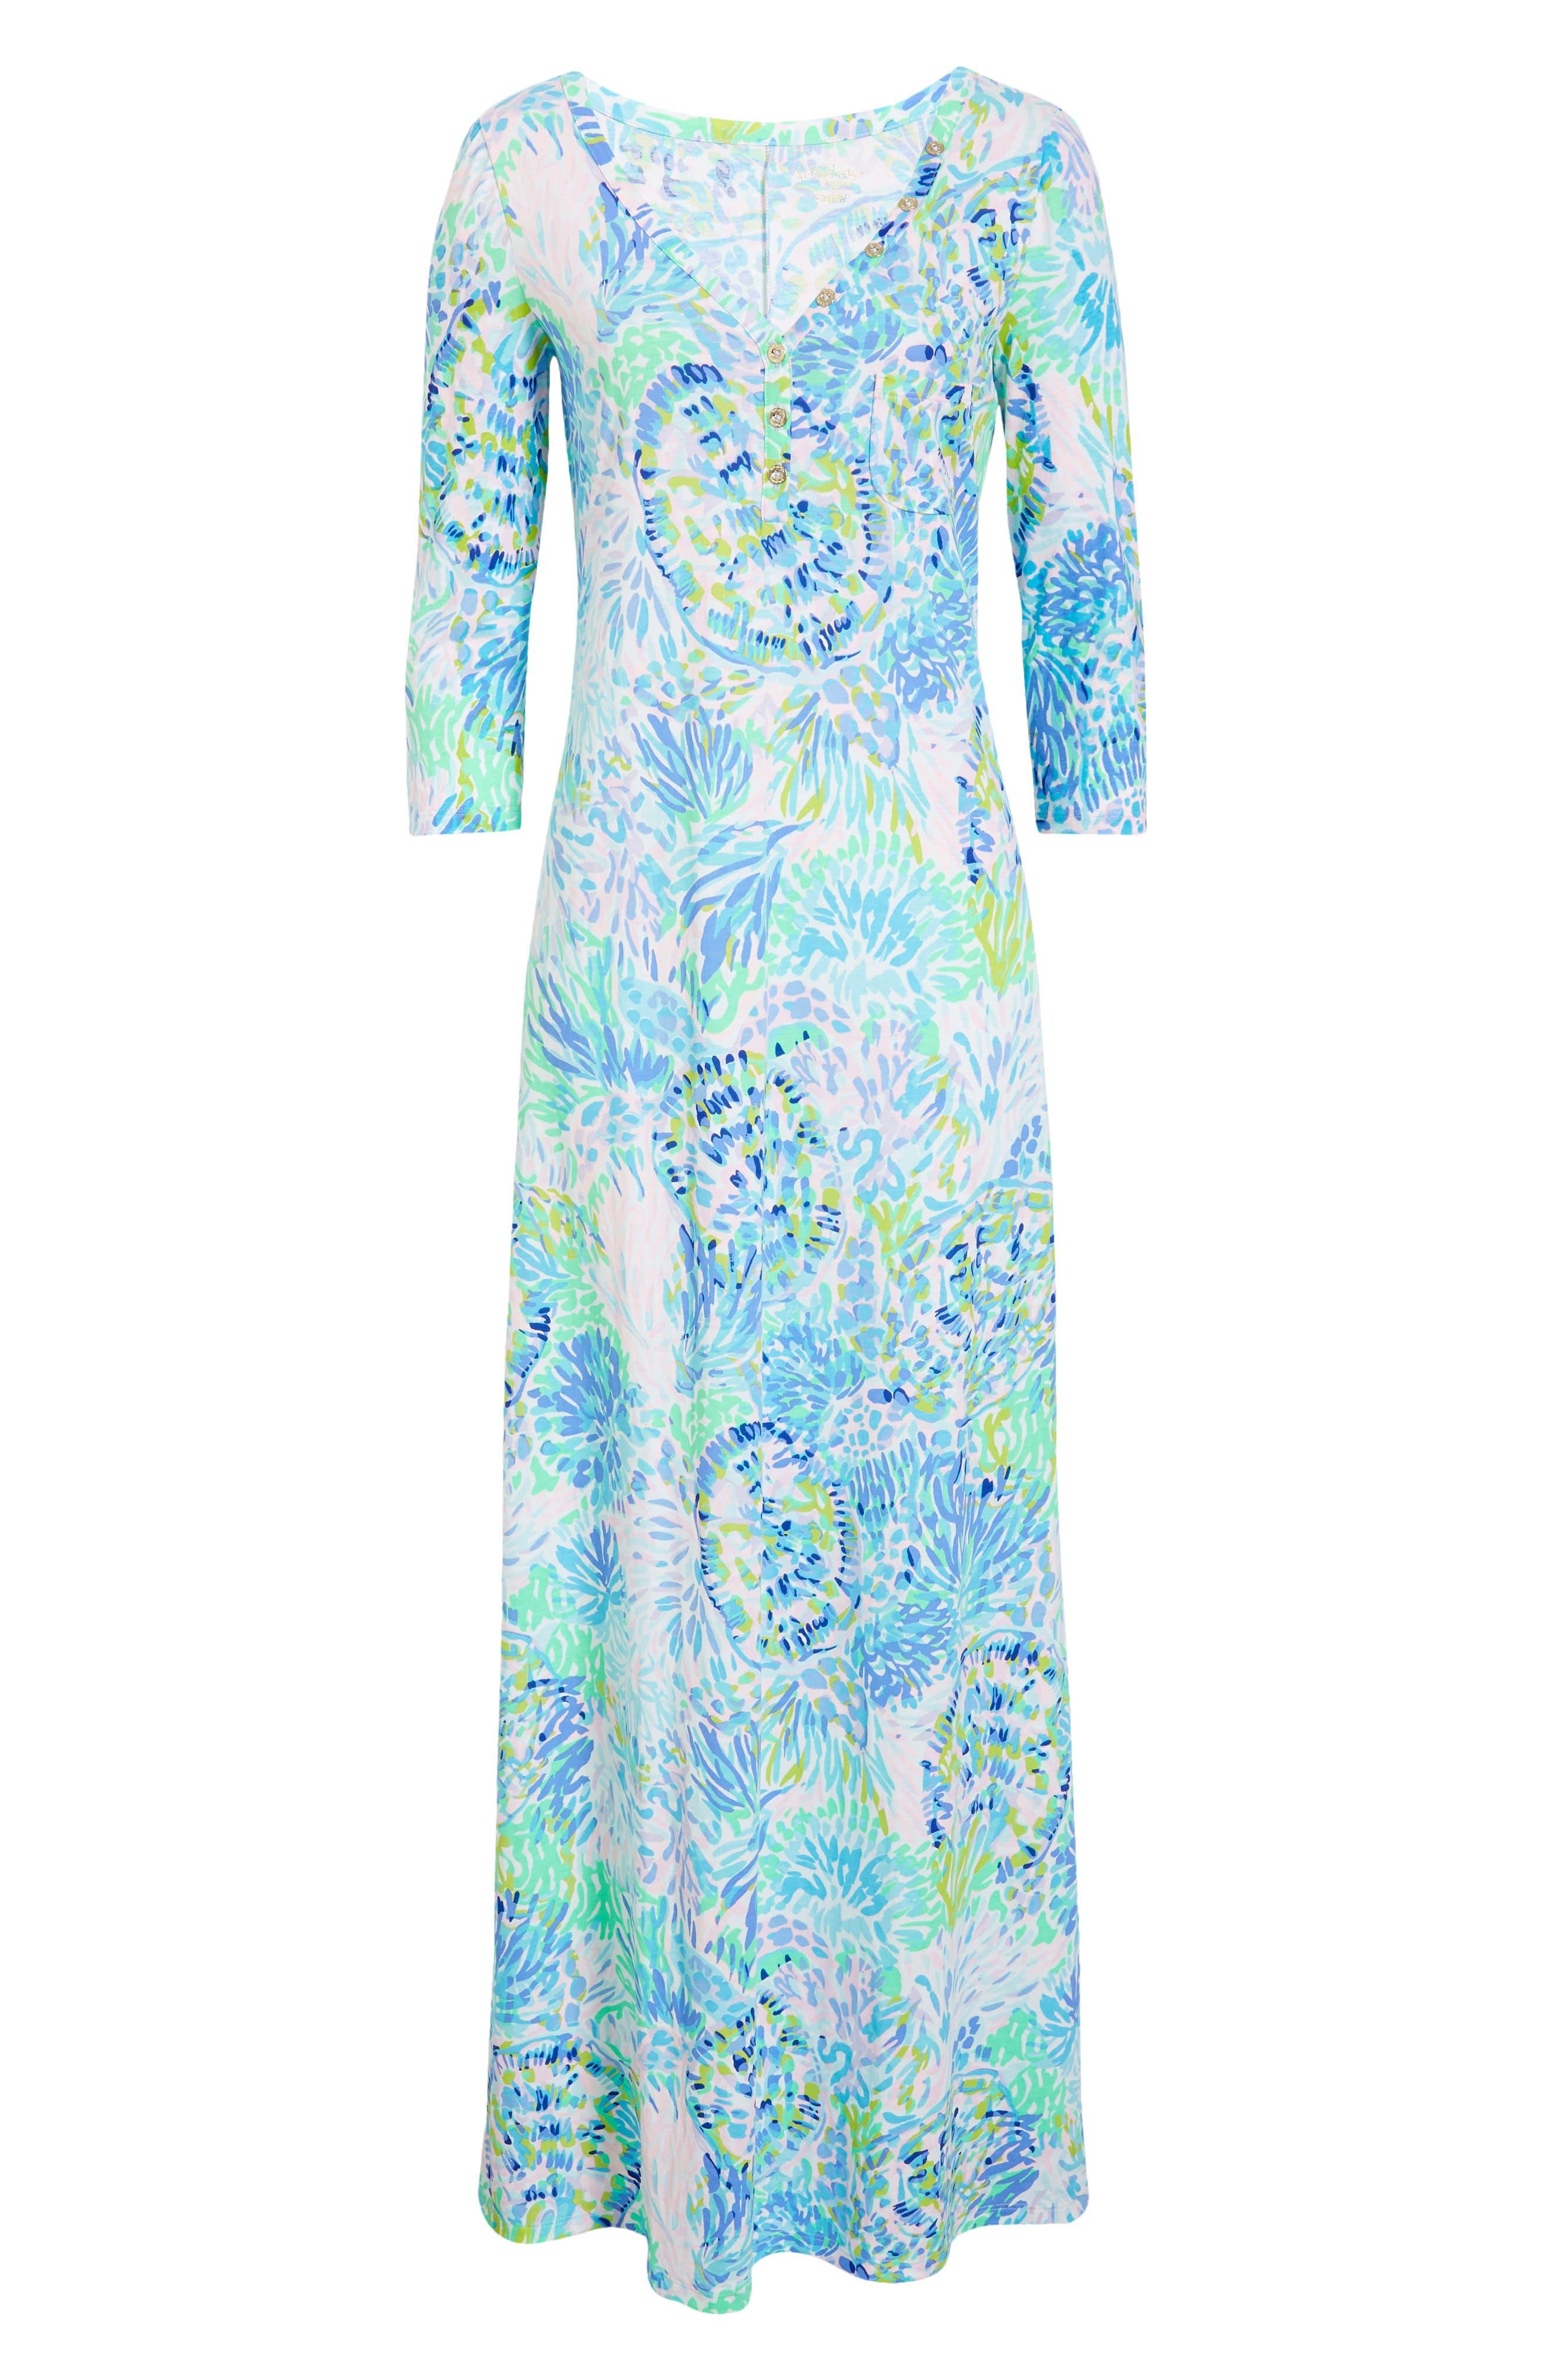 Women's Lilly Pulitzer Palmetto Dress